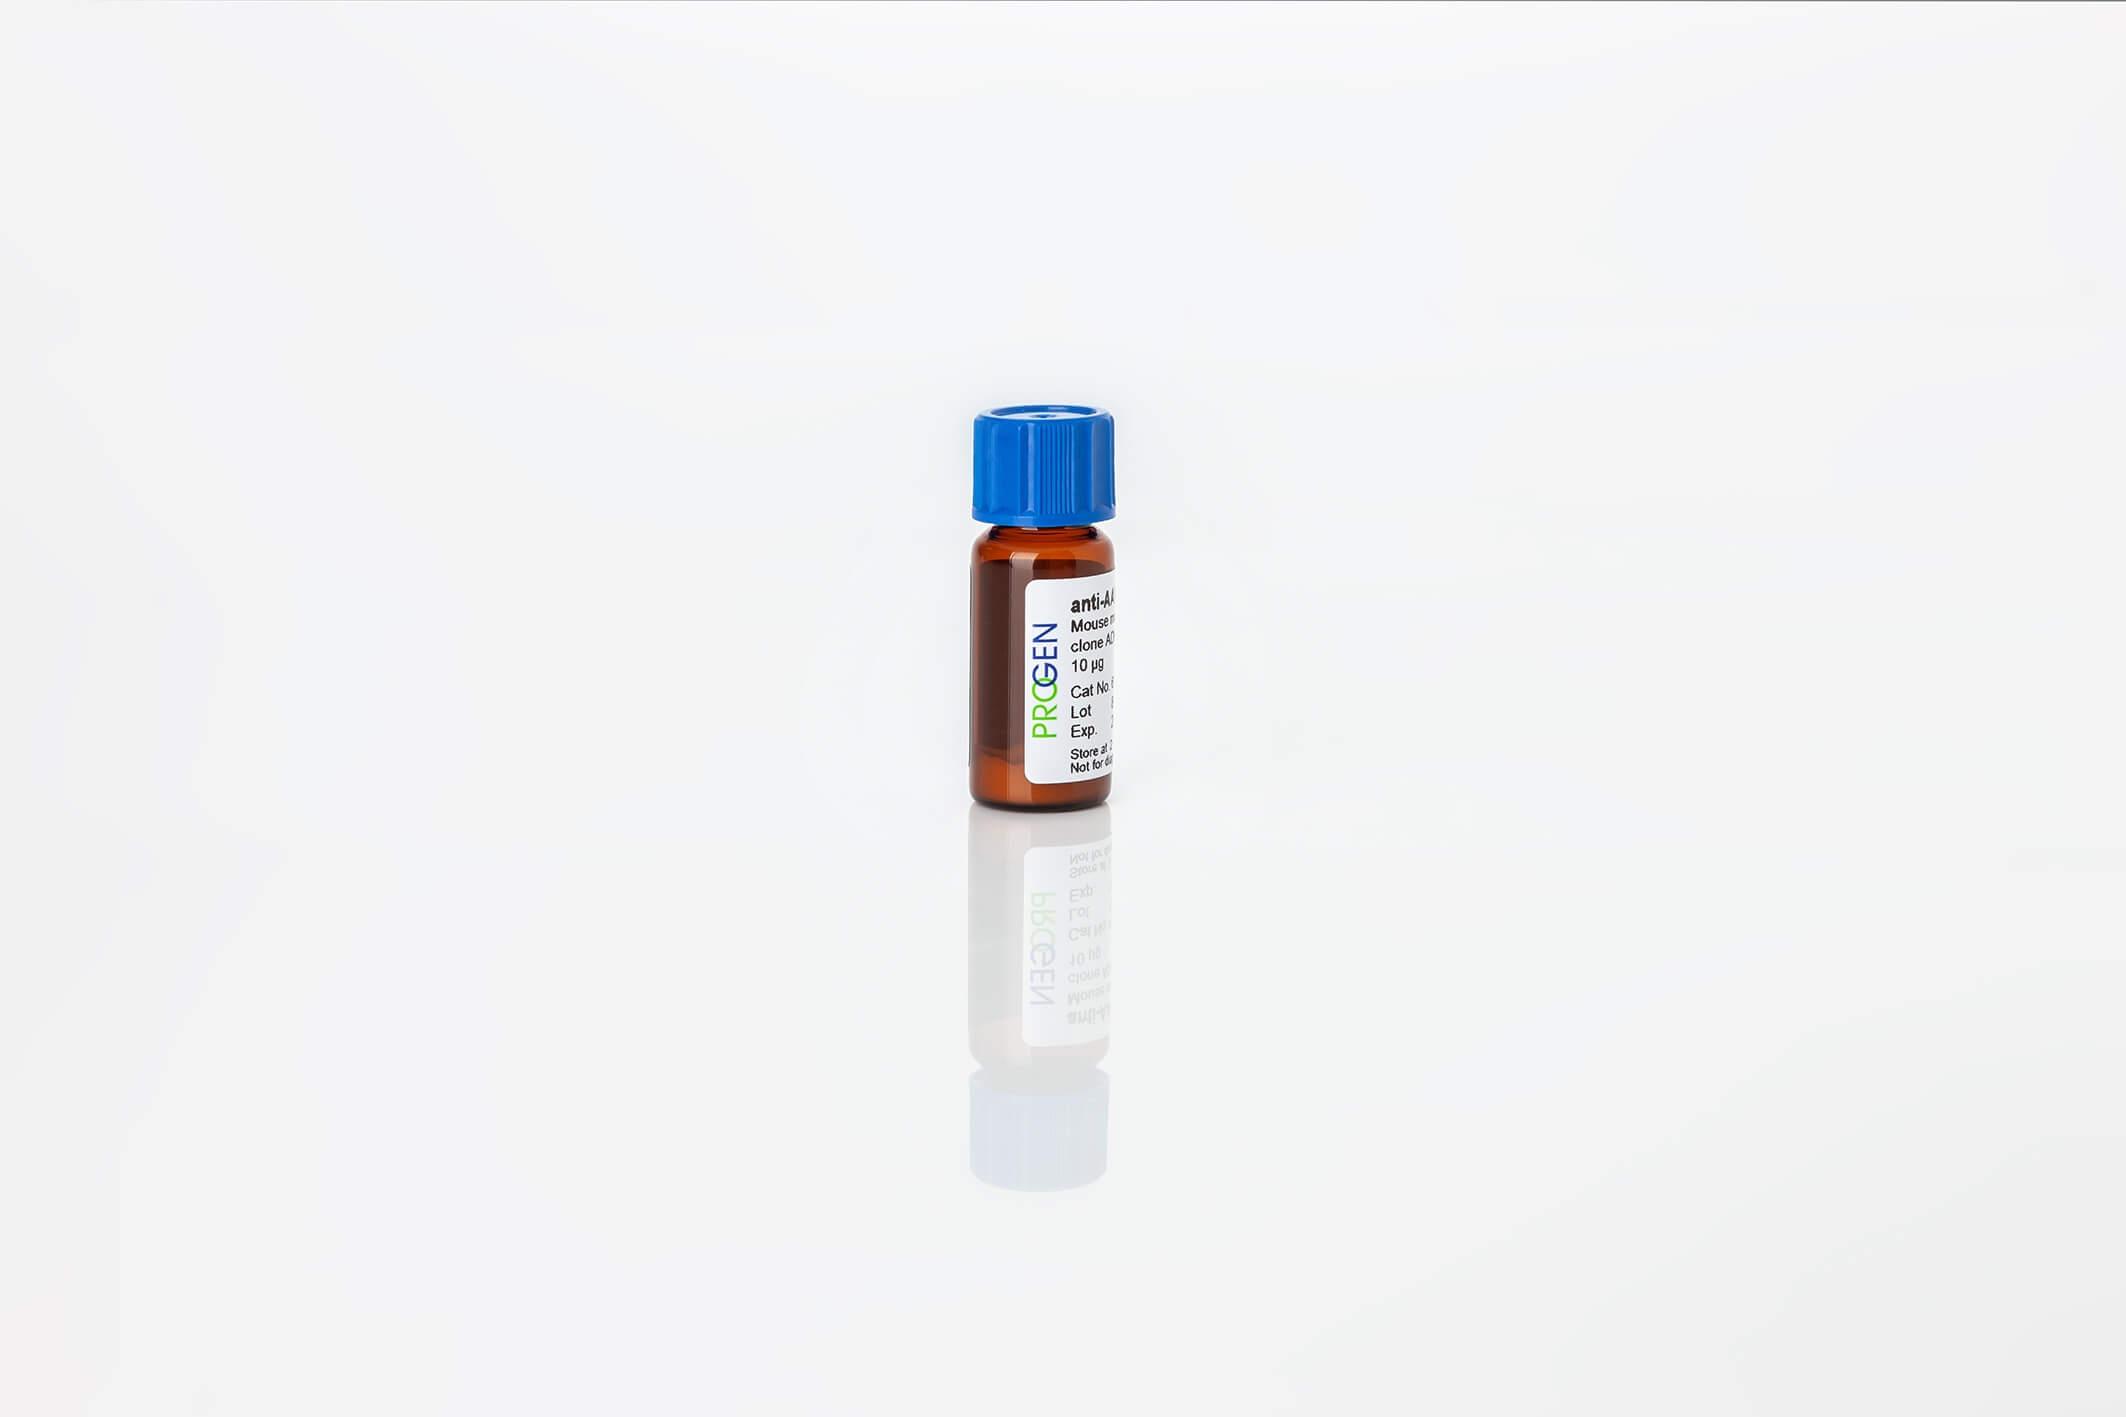 anti-Nitric Oxide Synthase (N-terminus) rabbit polyclonal, serum